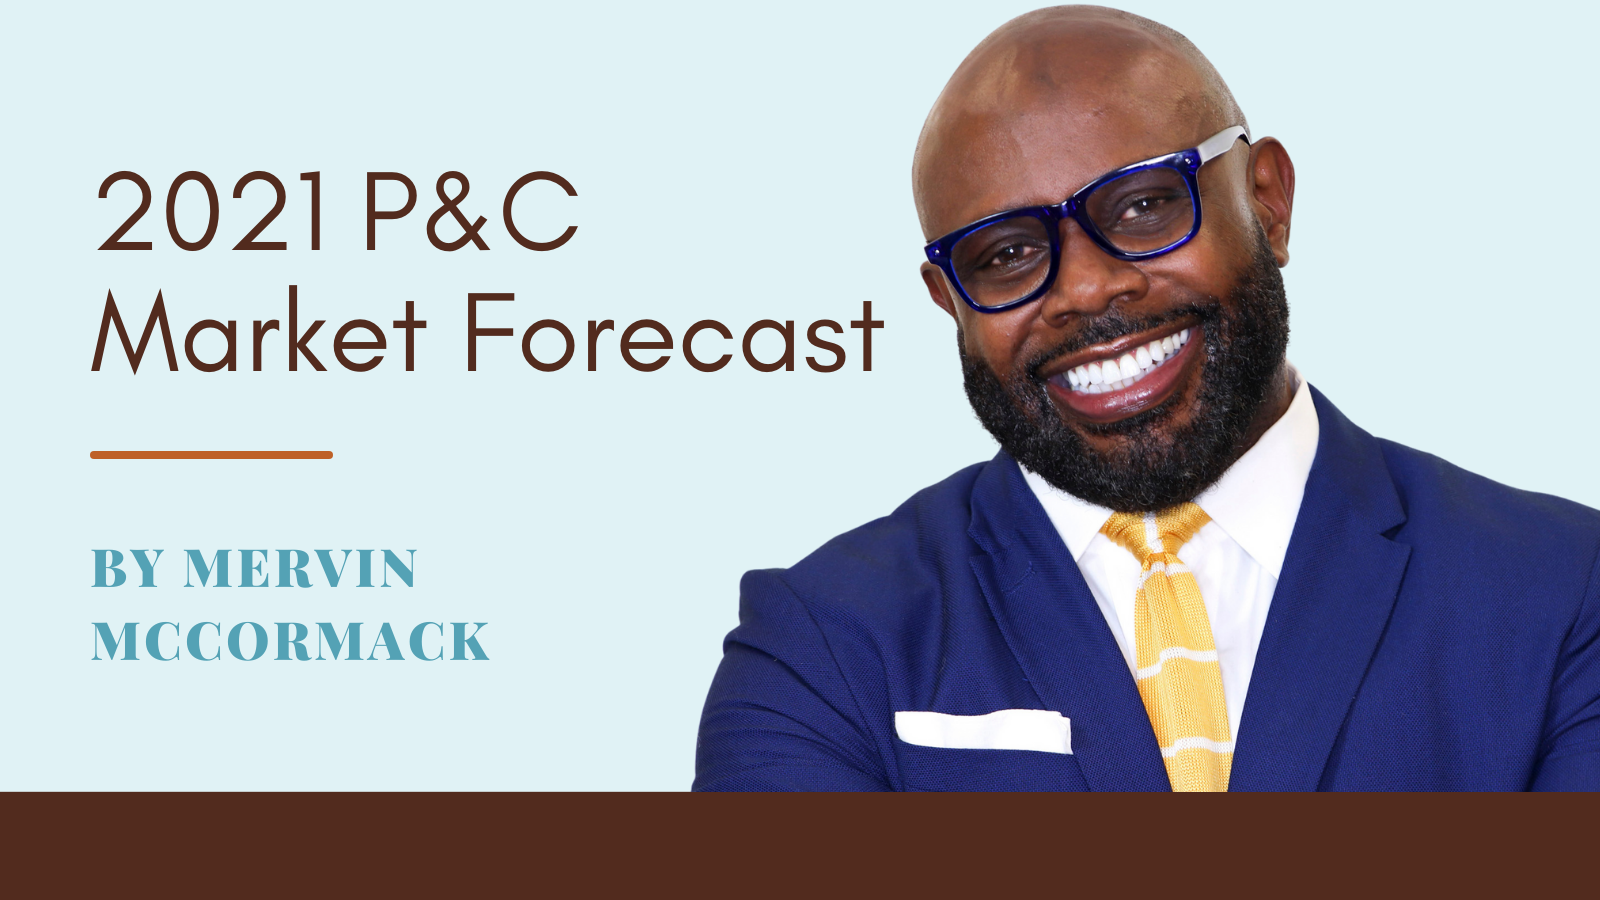 Mervin McCormack's 2021 P&C Market Forecast